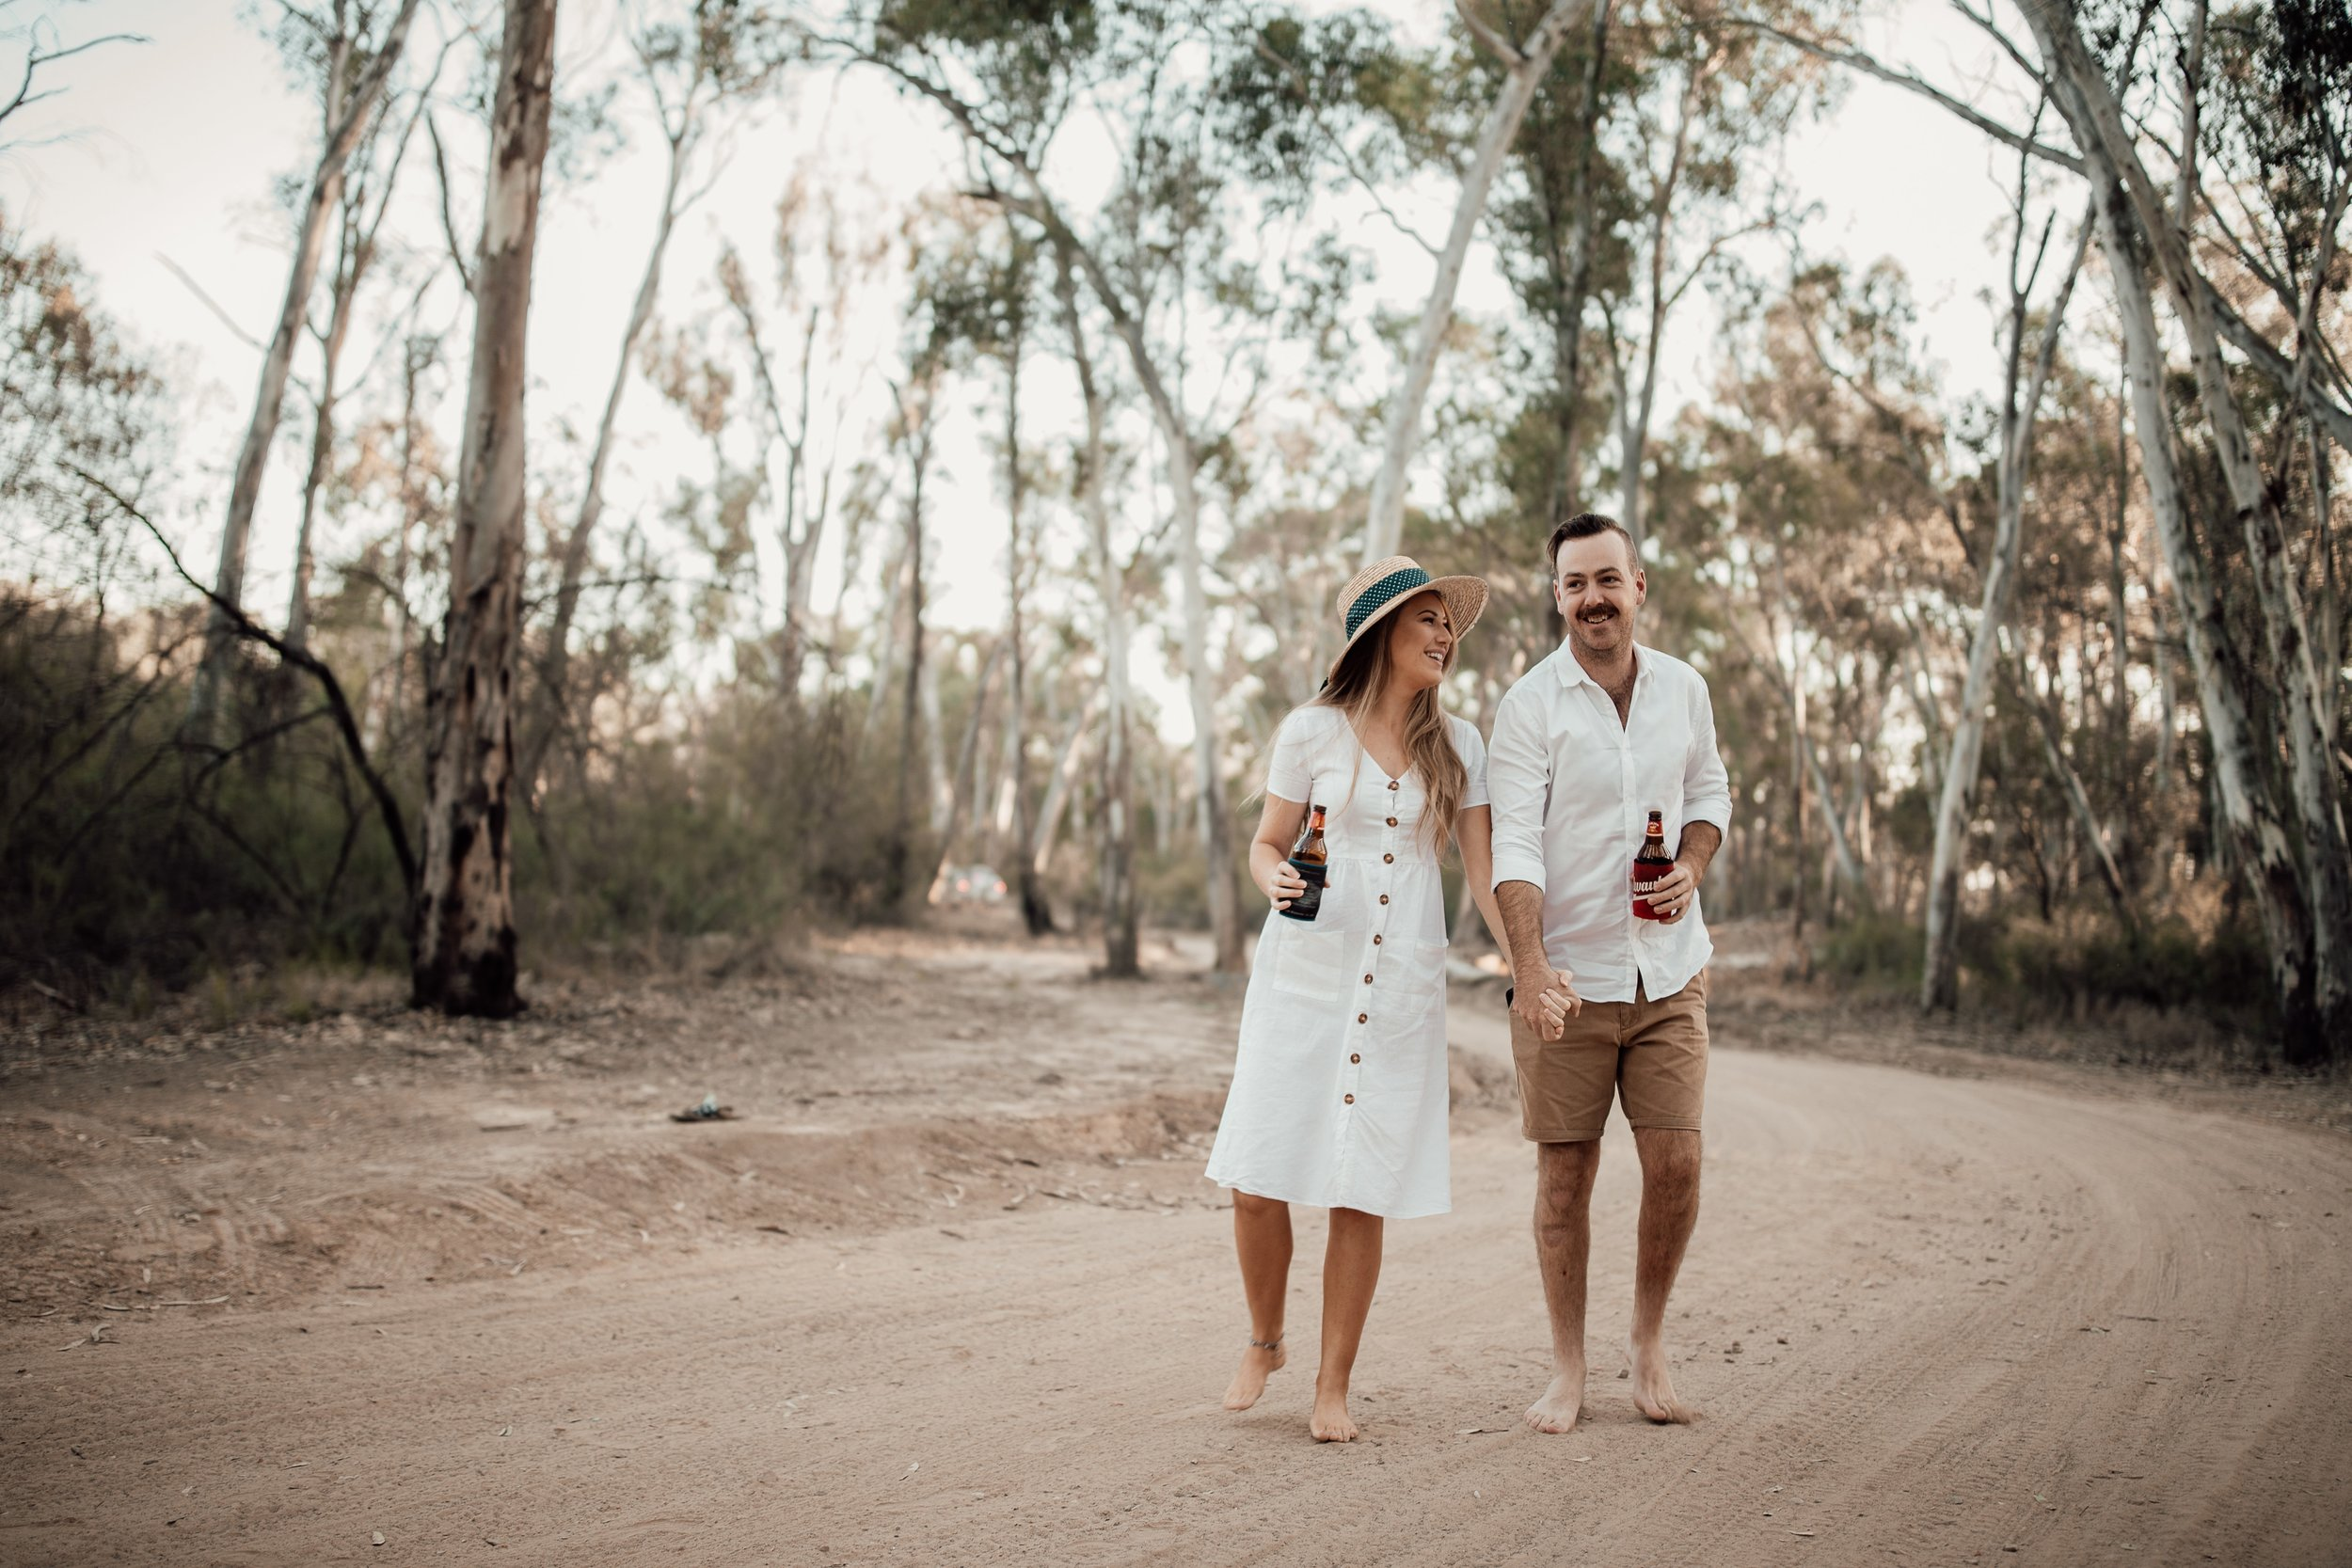 mickalathomas_puremacphotography_weddingphotographer_couplephotographer_Sheppartonphotographer_2808.jpg